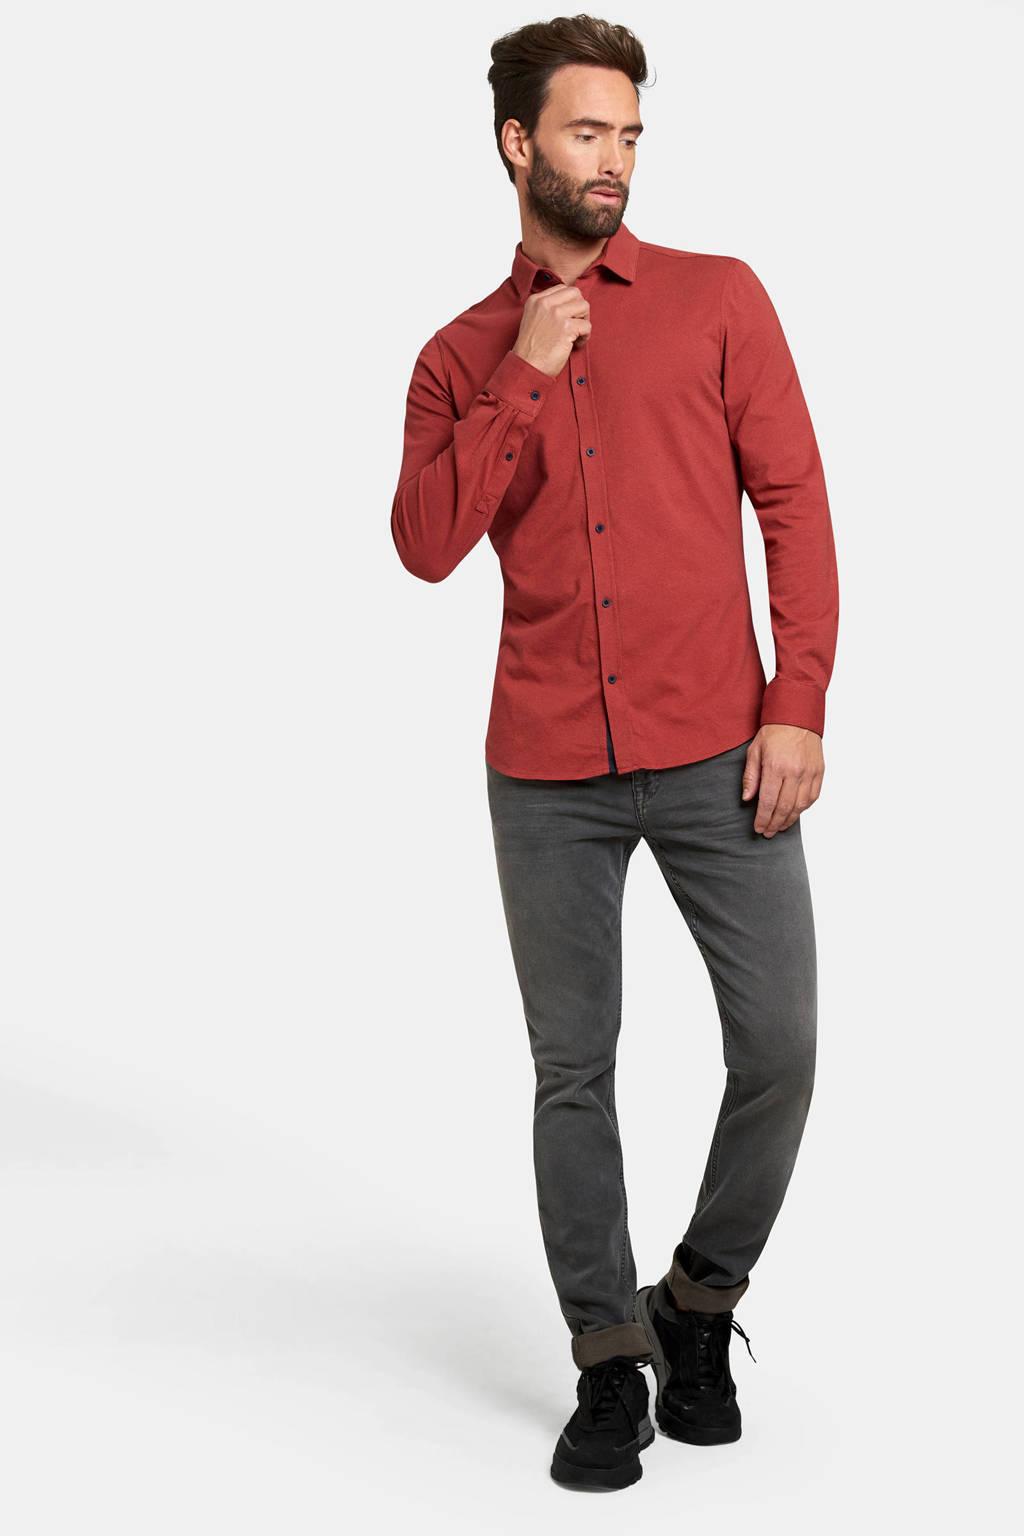 Refill by Shoeby gemêleerd slim fit overhemd rood, Rood